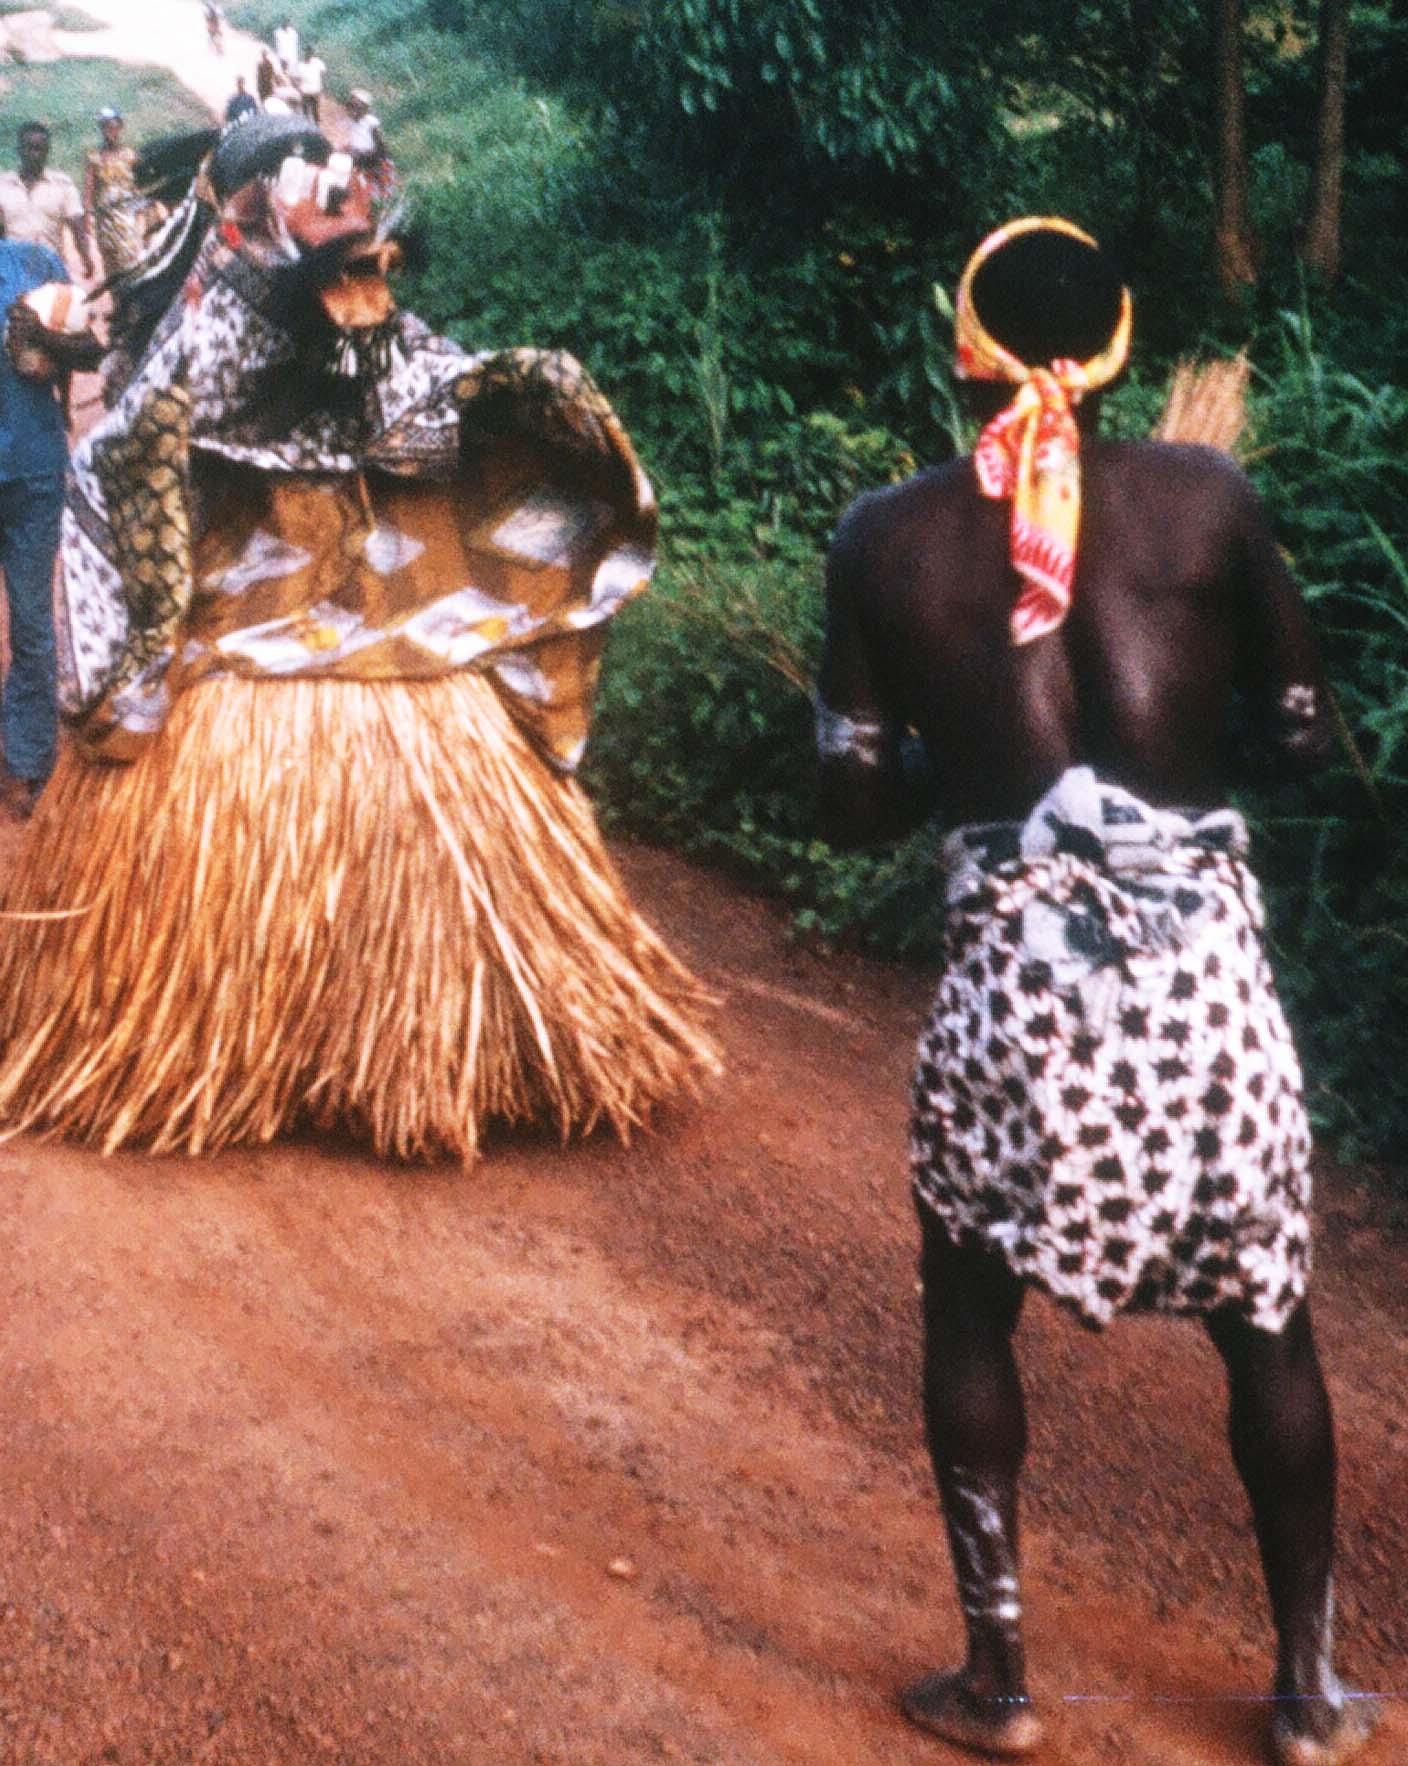 Liberian Bush Devil photo by Curtis Mekemson.